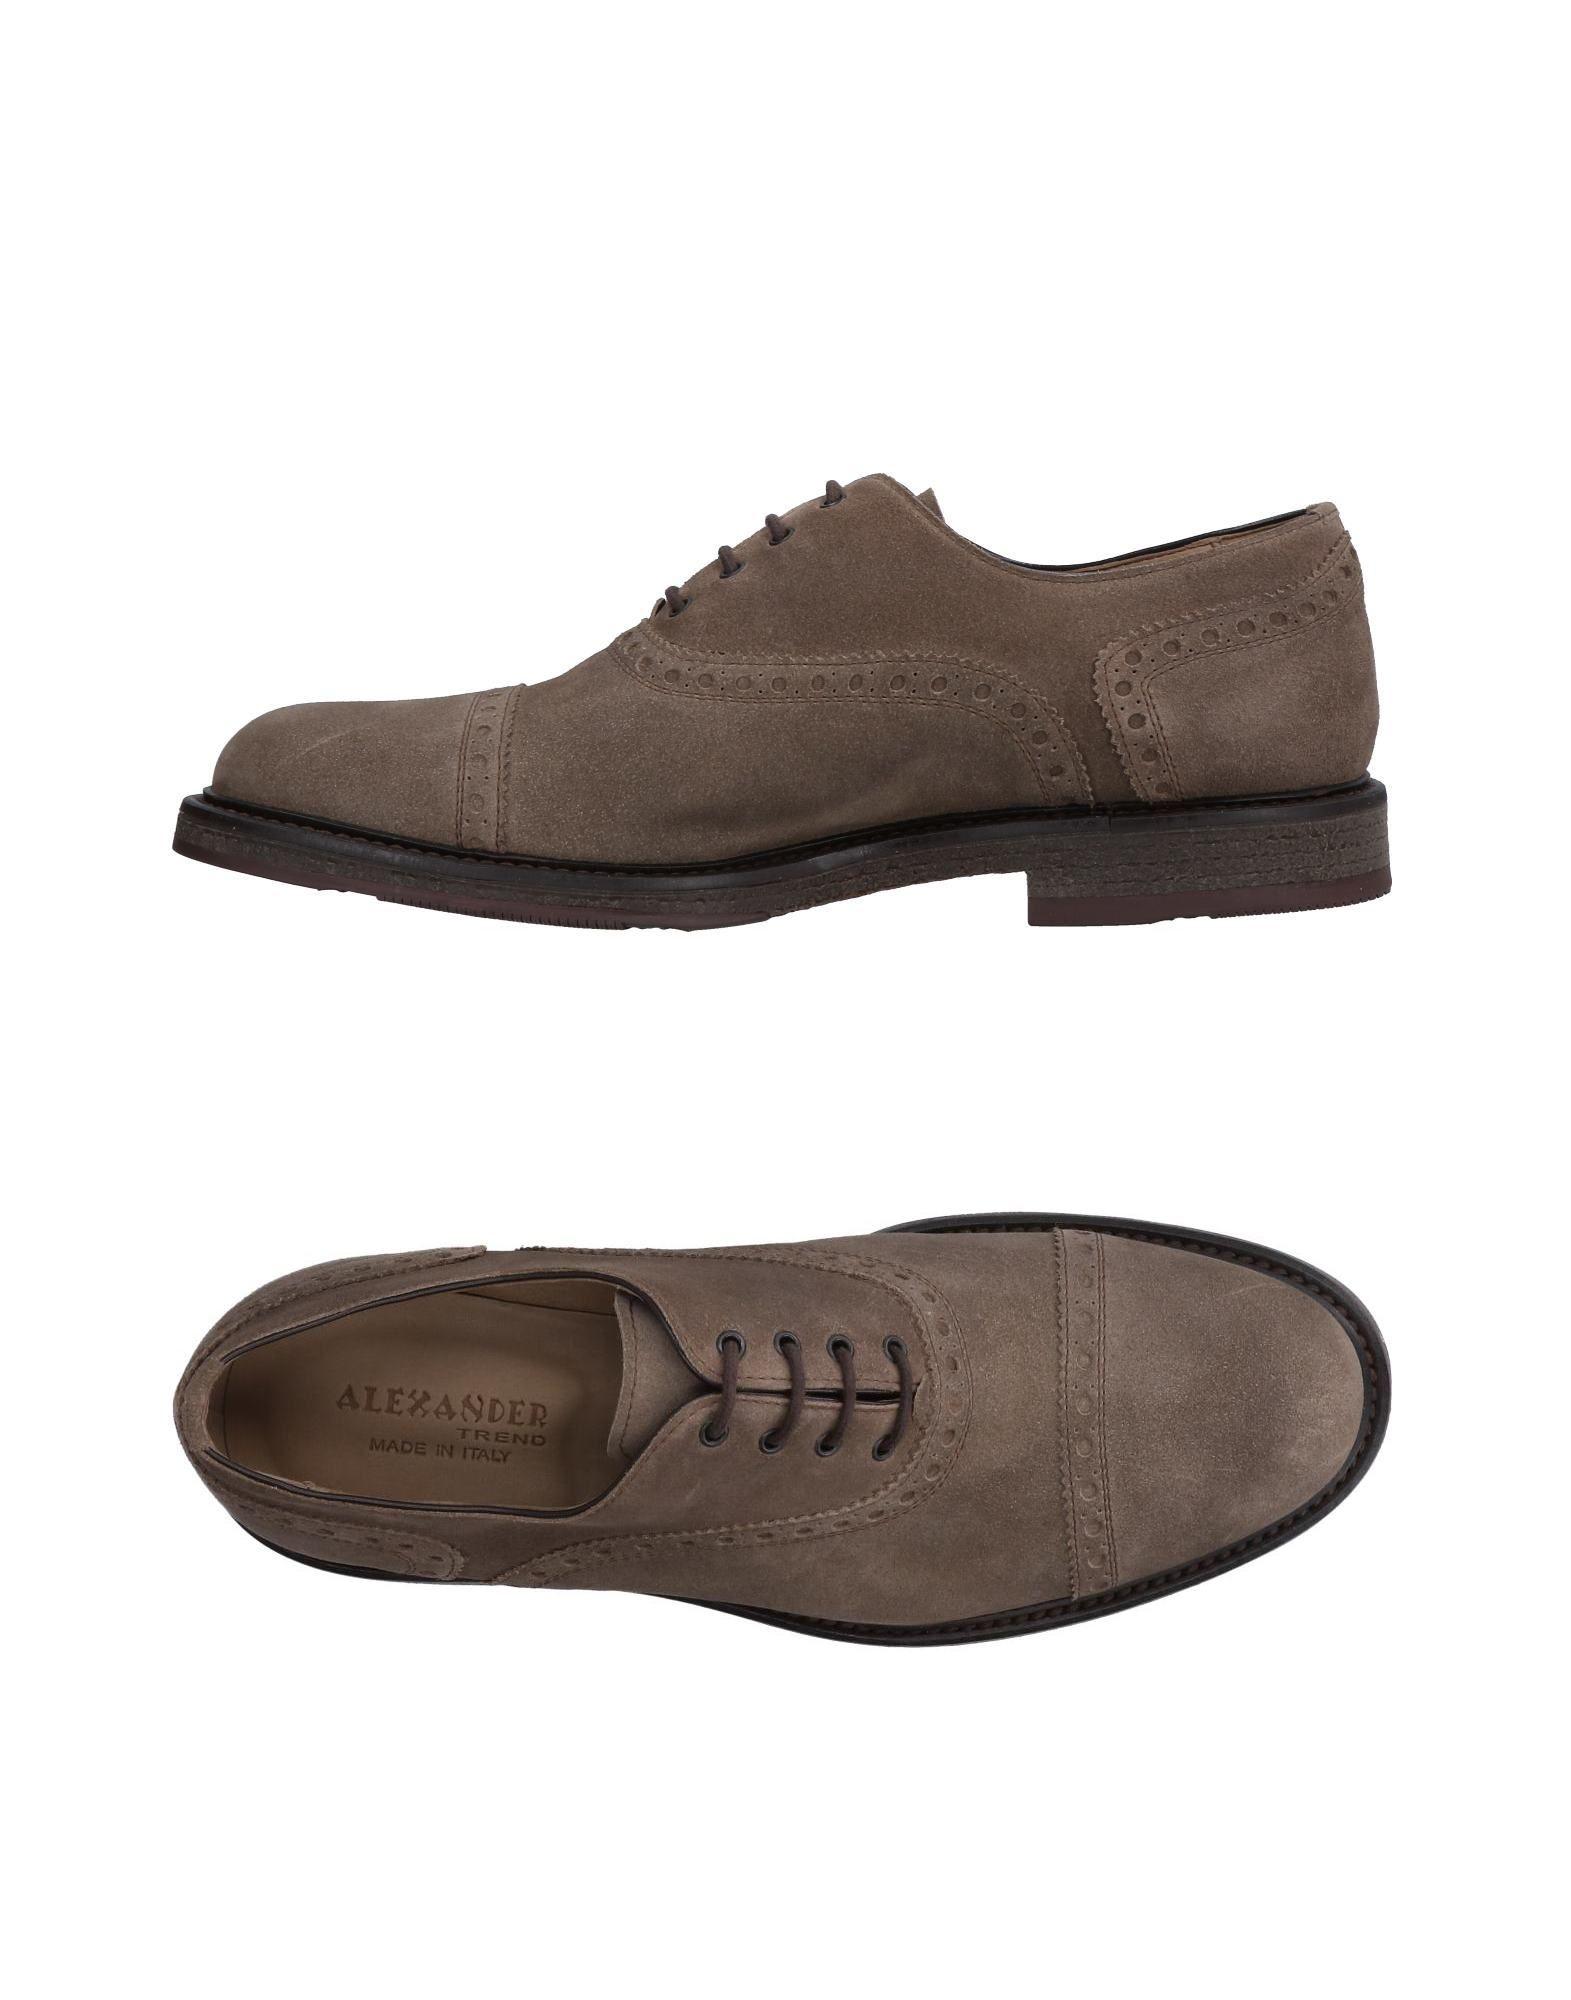 Rabatt echte Schuhe Alexander Trend Schnürschuhe Herren  11056945VO